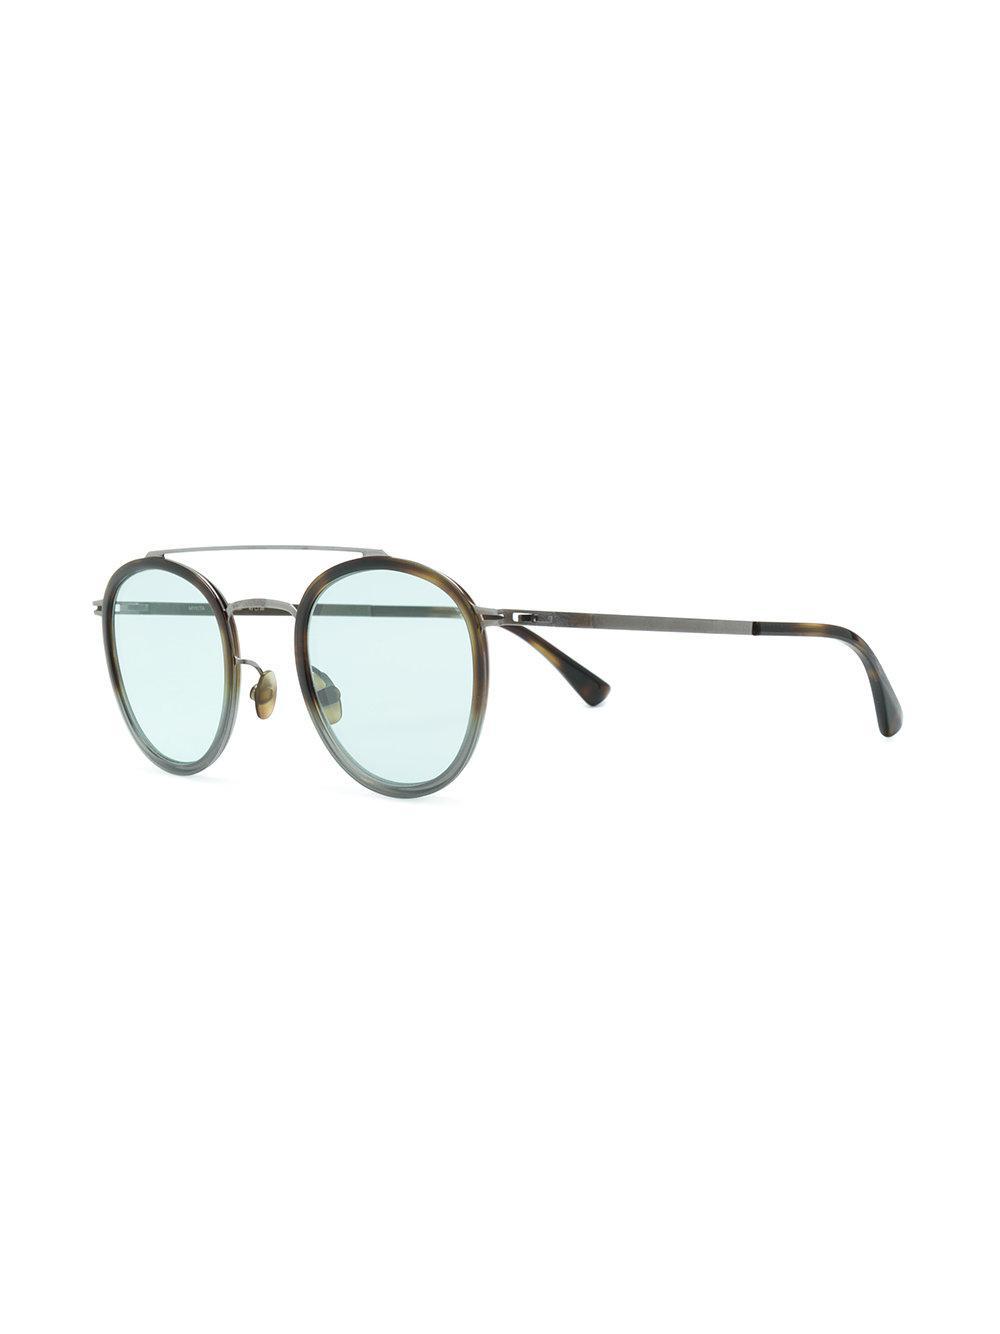 Mykita Round Frame In Lyst Olli Black Sunglasses qSqaTwB